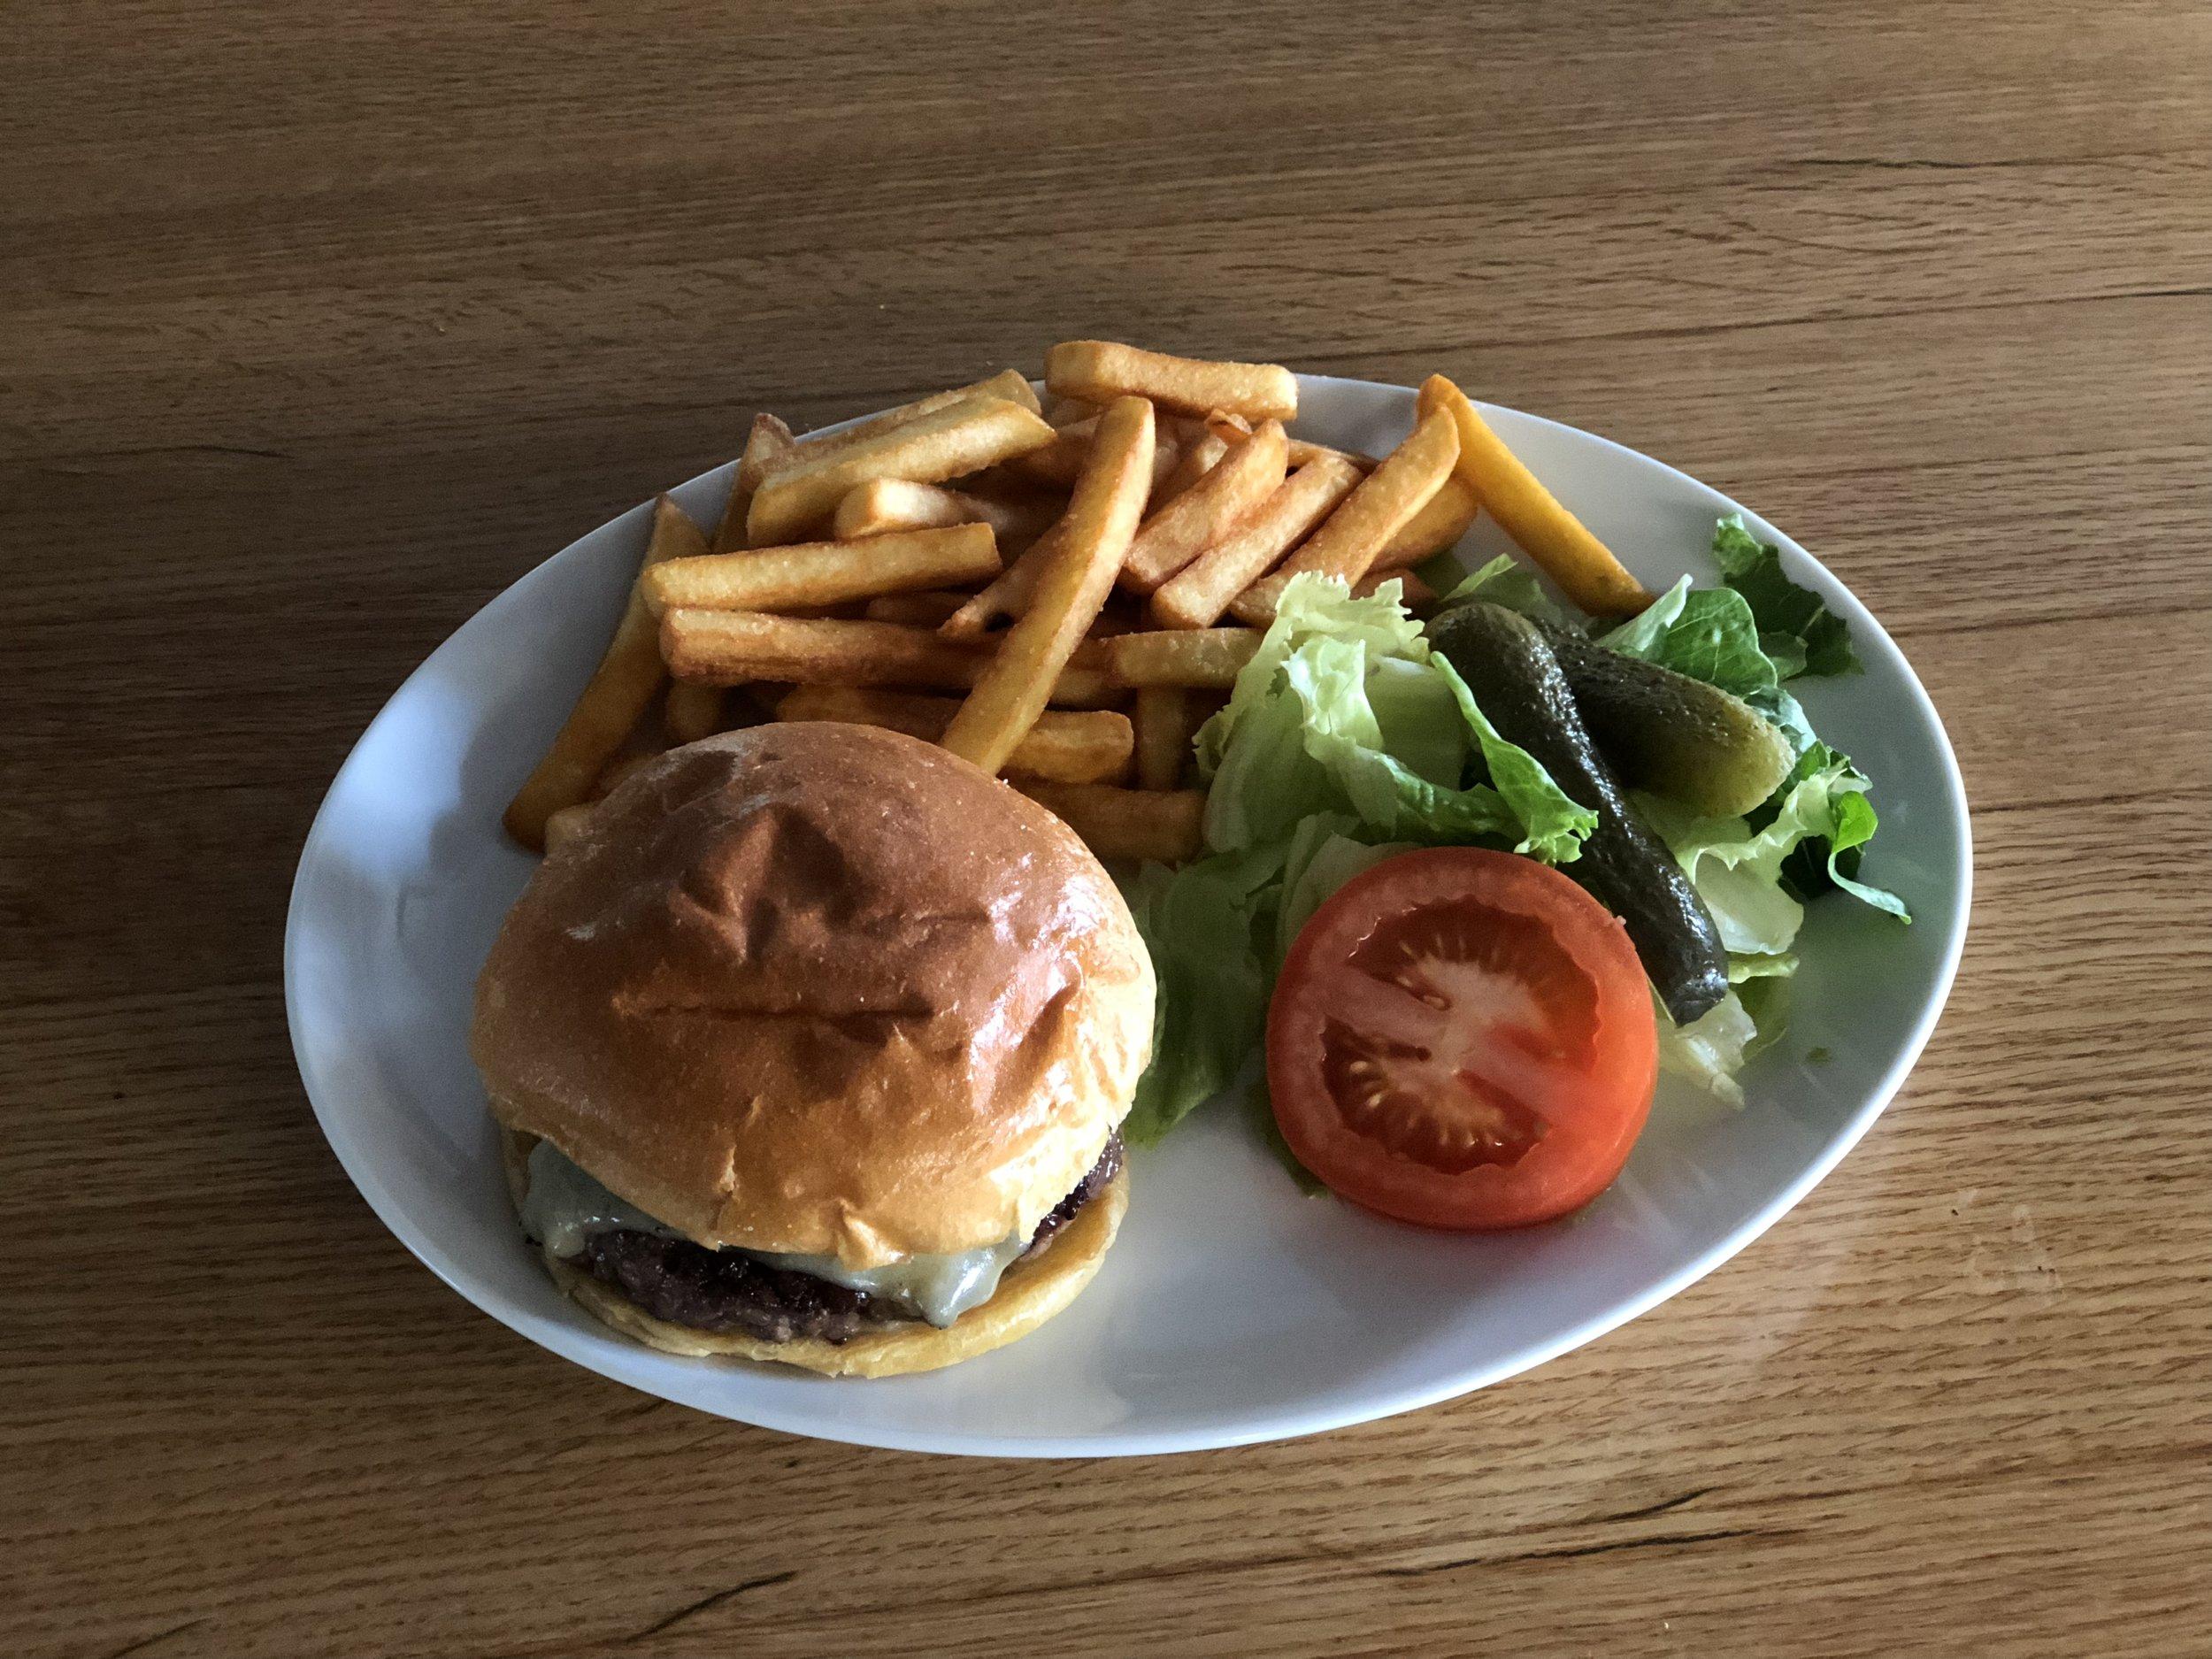 2018-08-08 16.52.31 burger.jpg